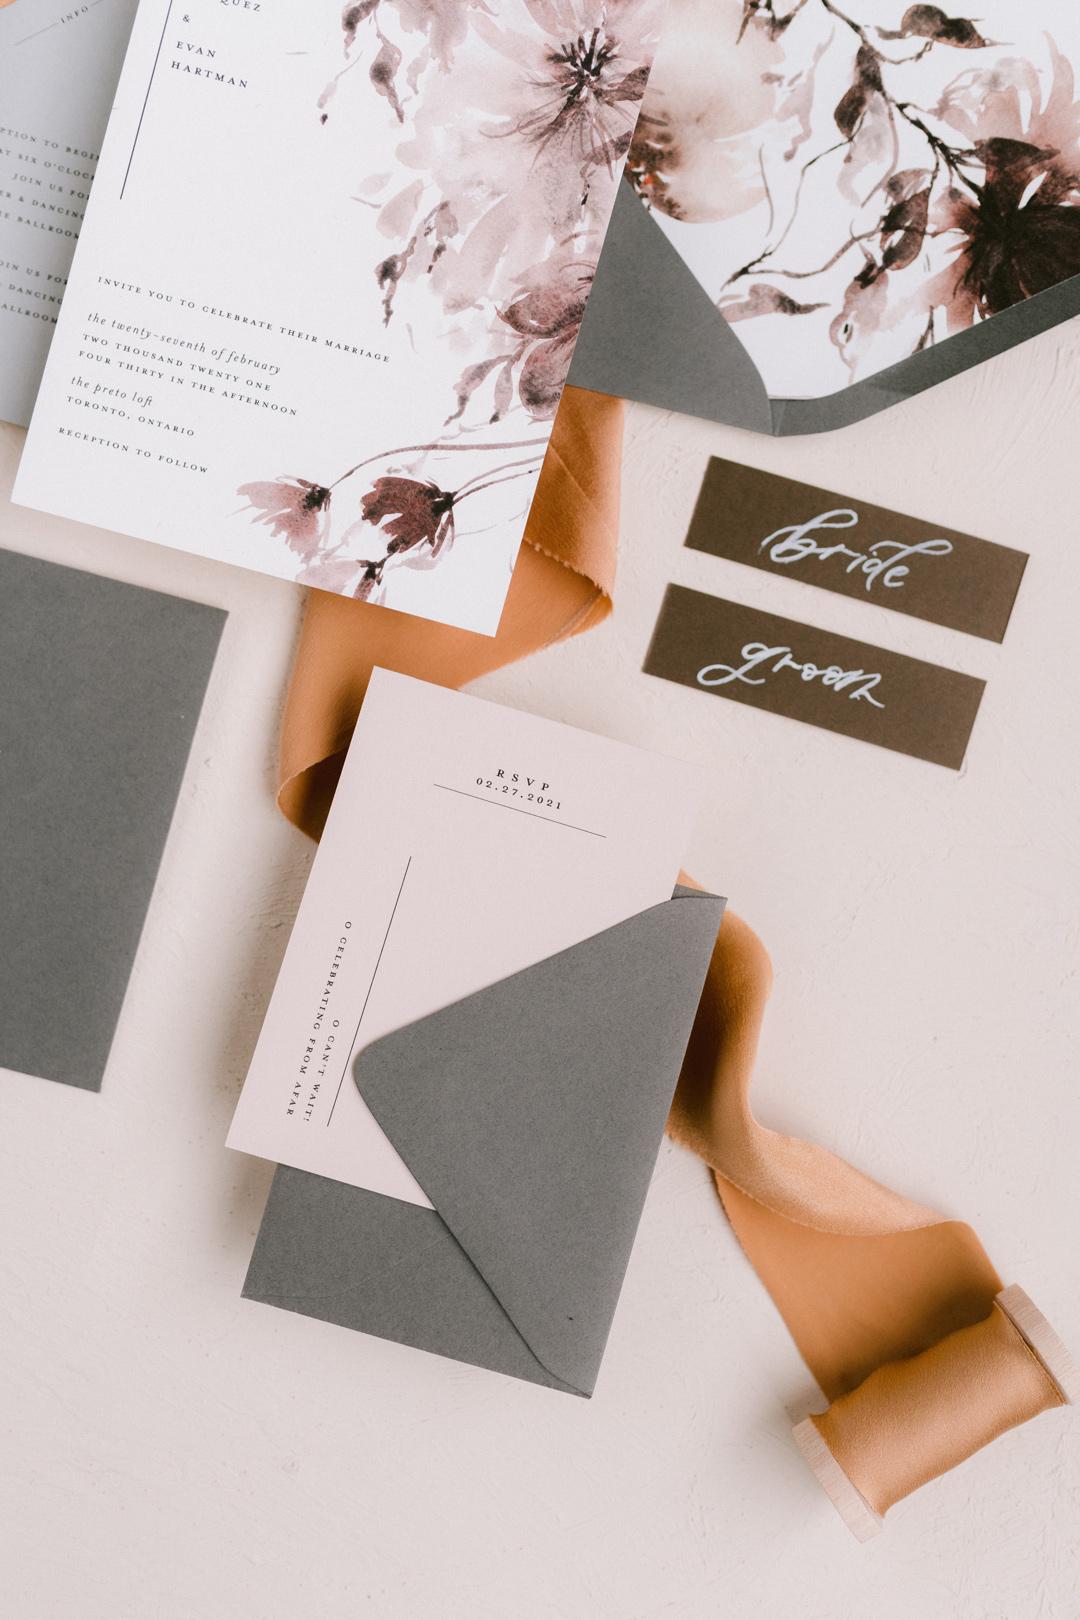 Beige wedding invitation cards with grey envelopes